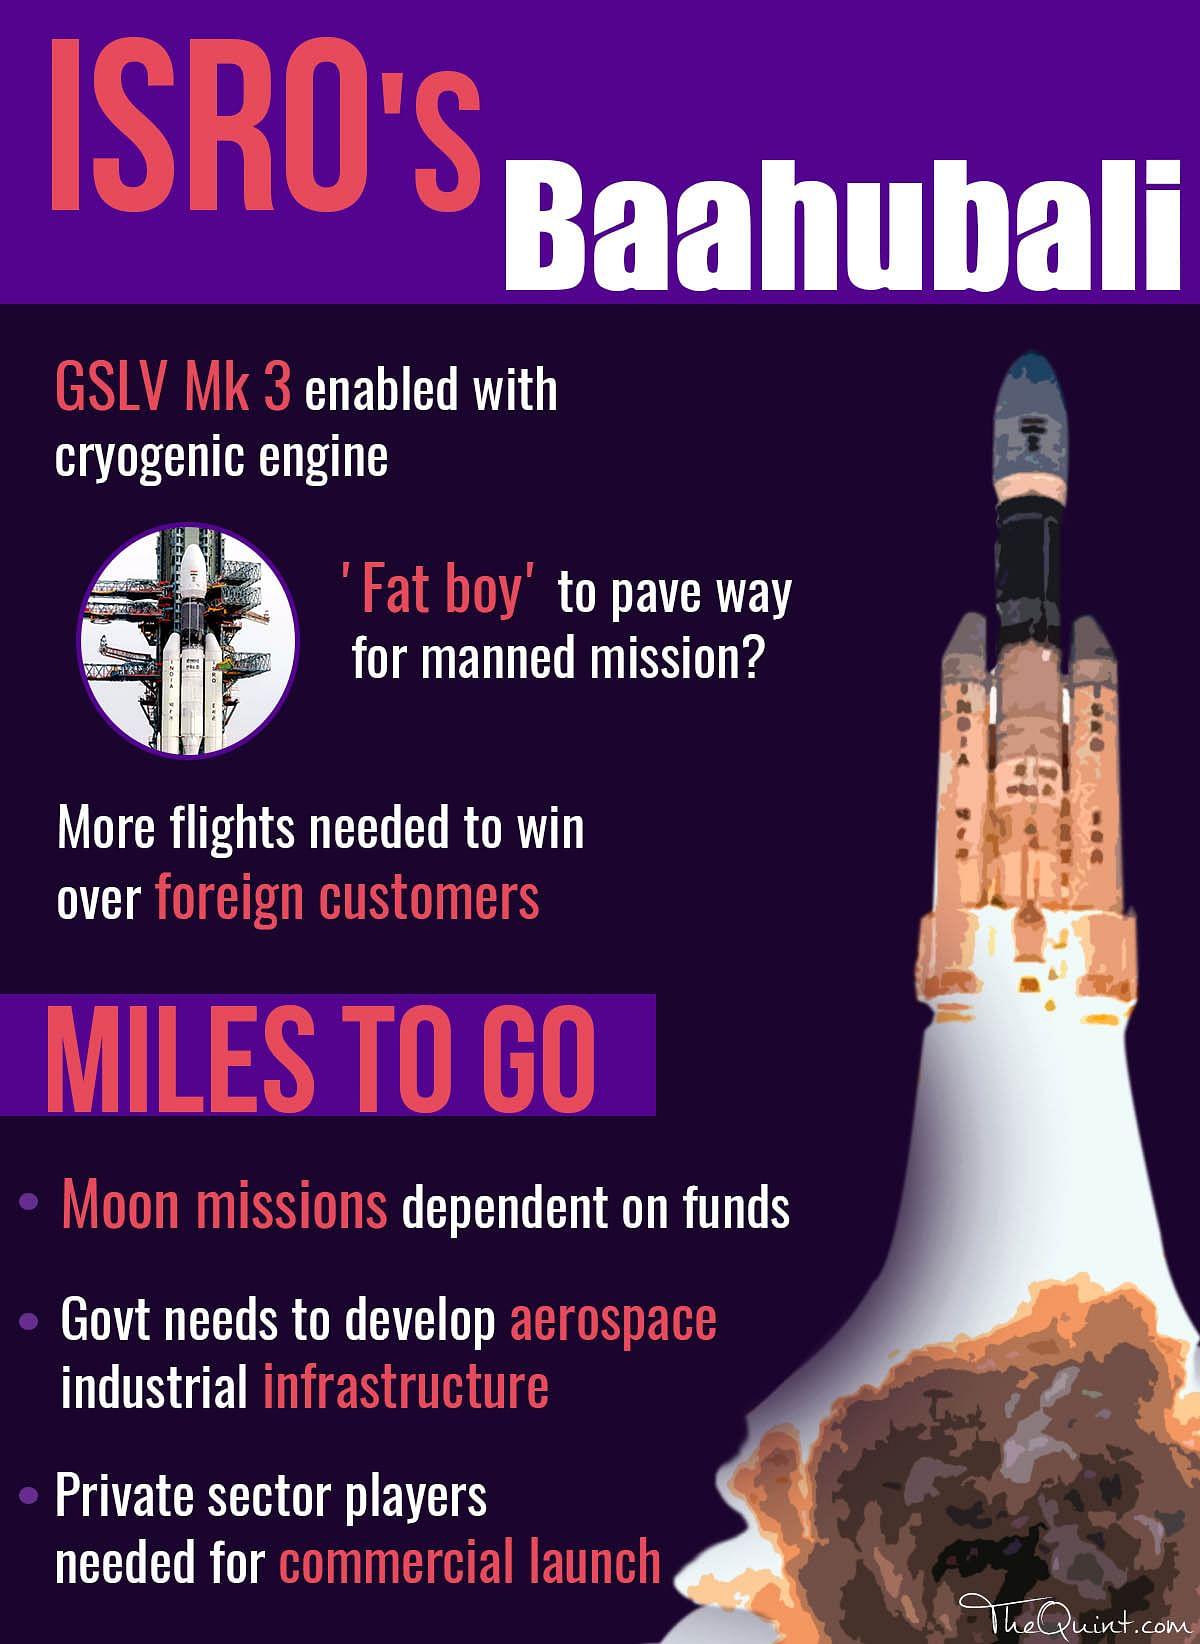 (Infographic: Rhythum Seth/ <b>The Quint</b>)